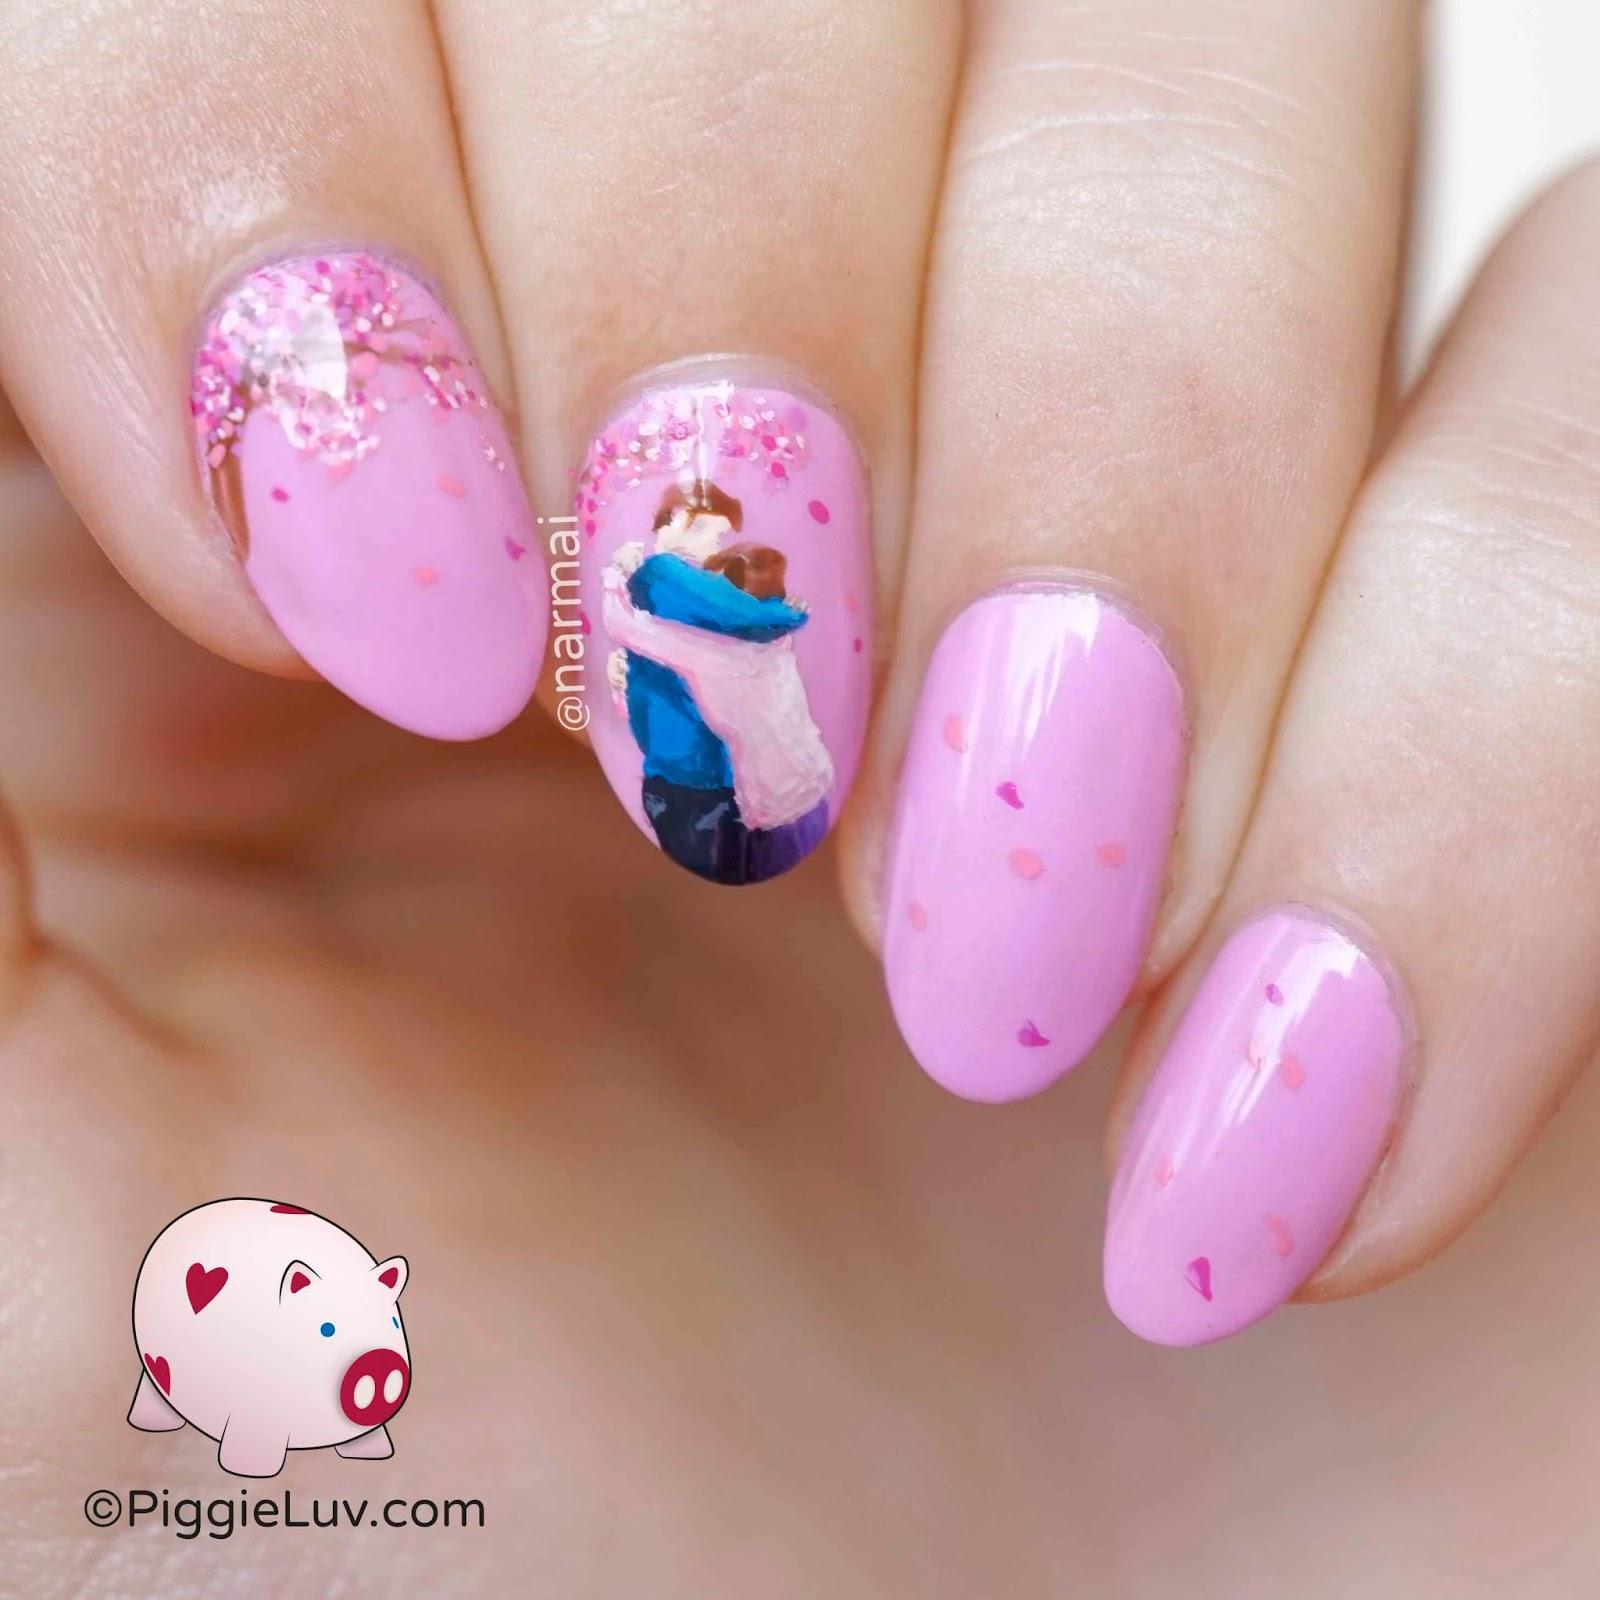 Piggieluv Rainbow Bubbles Nail Art: PiggieLuv